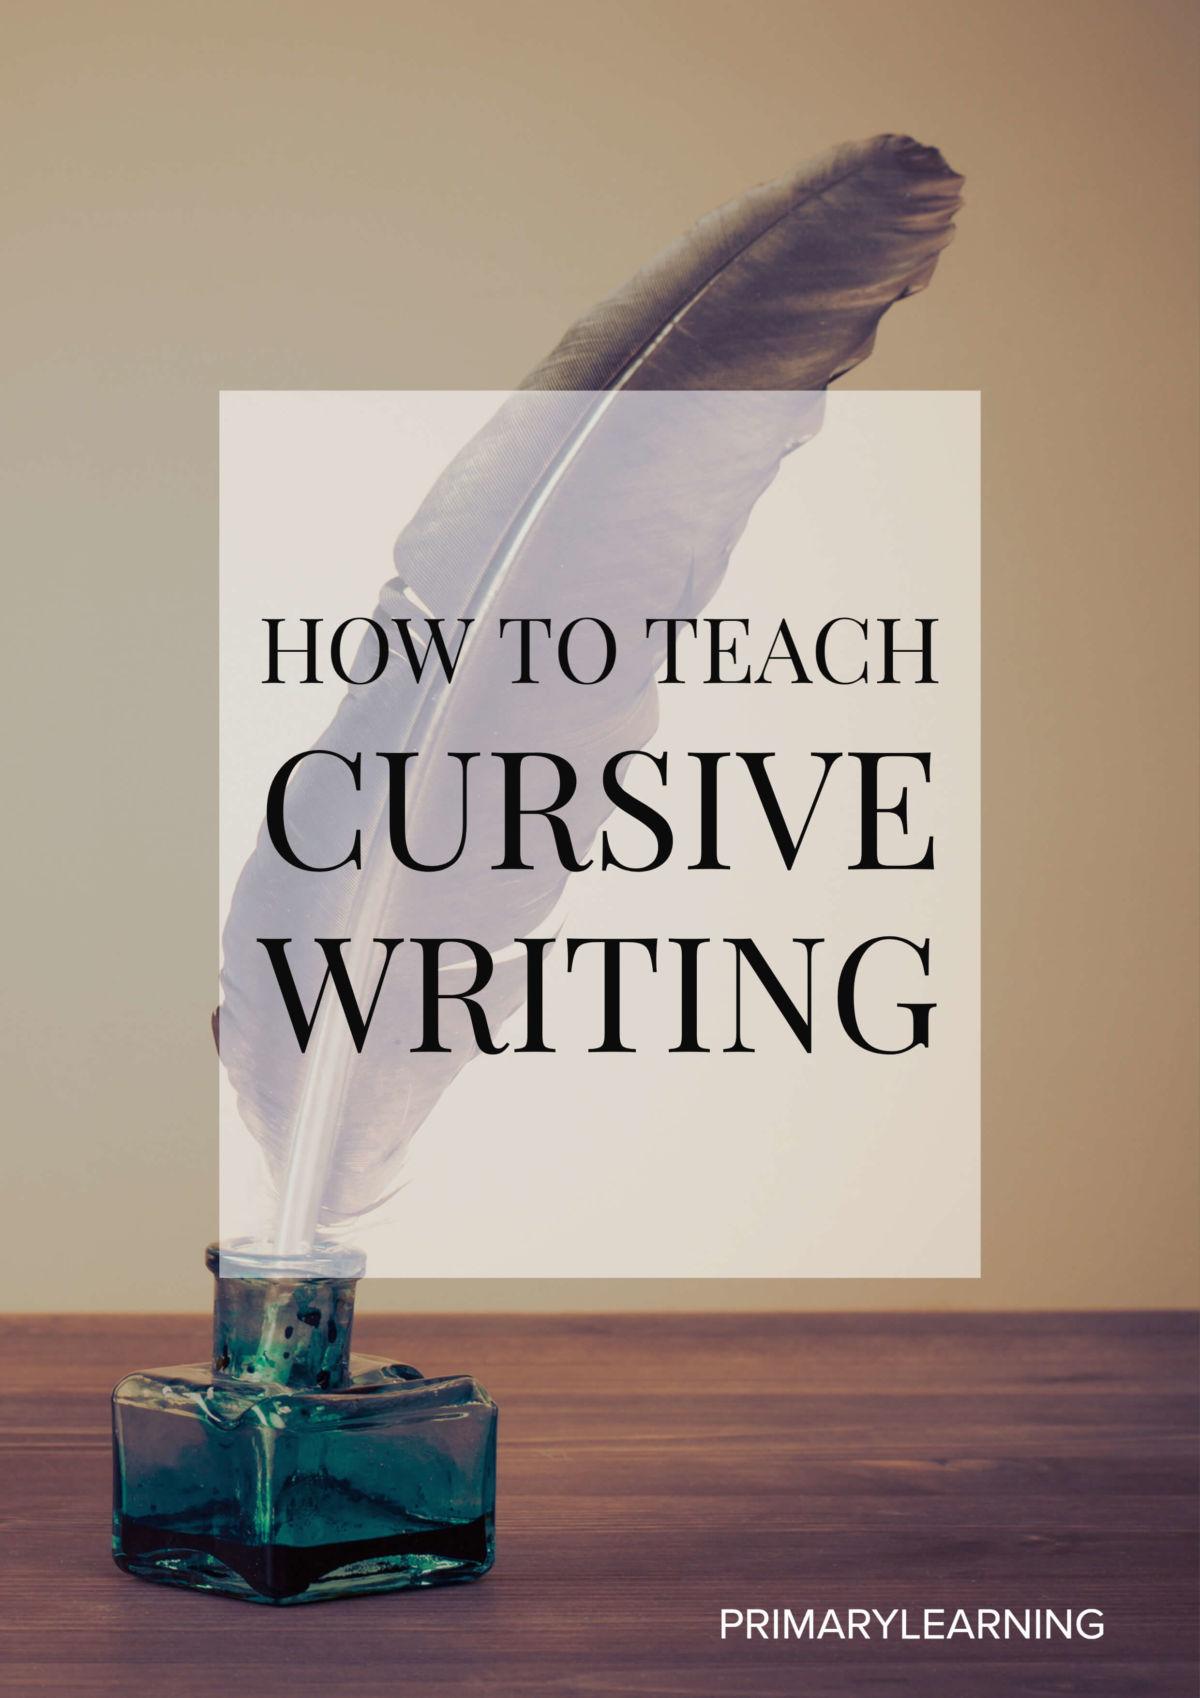 How To Teach Cursive Writing